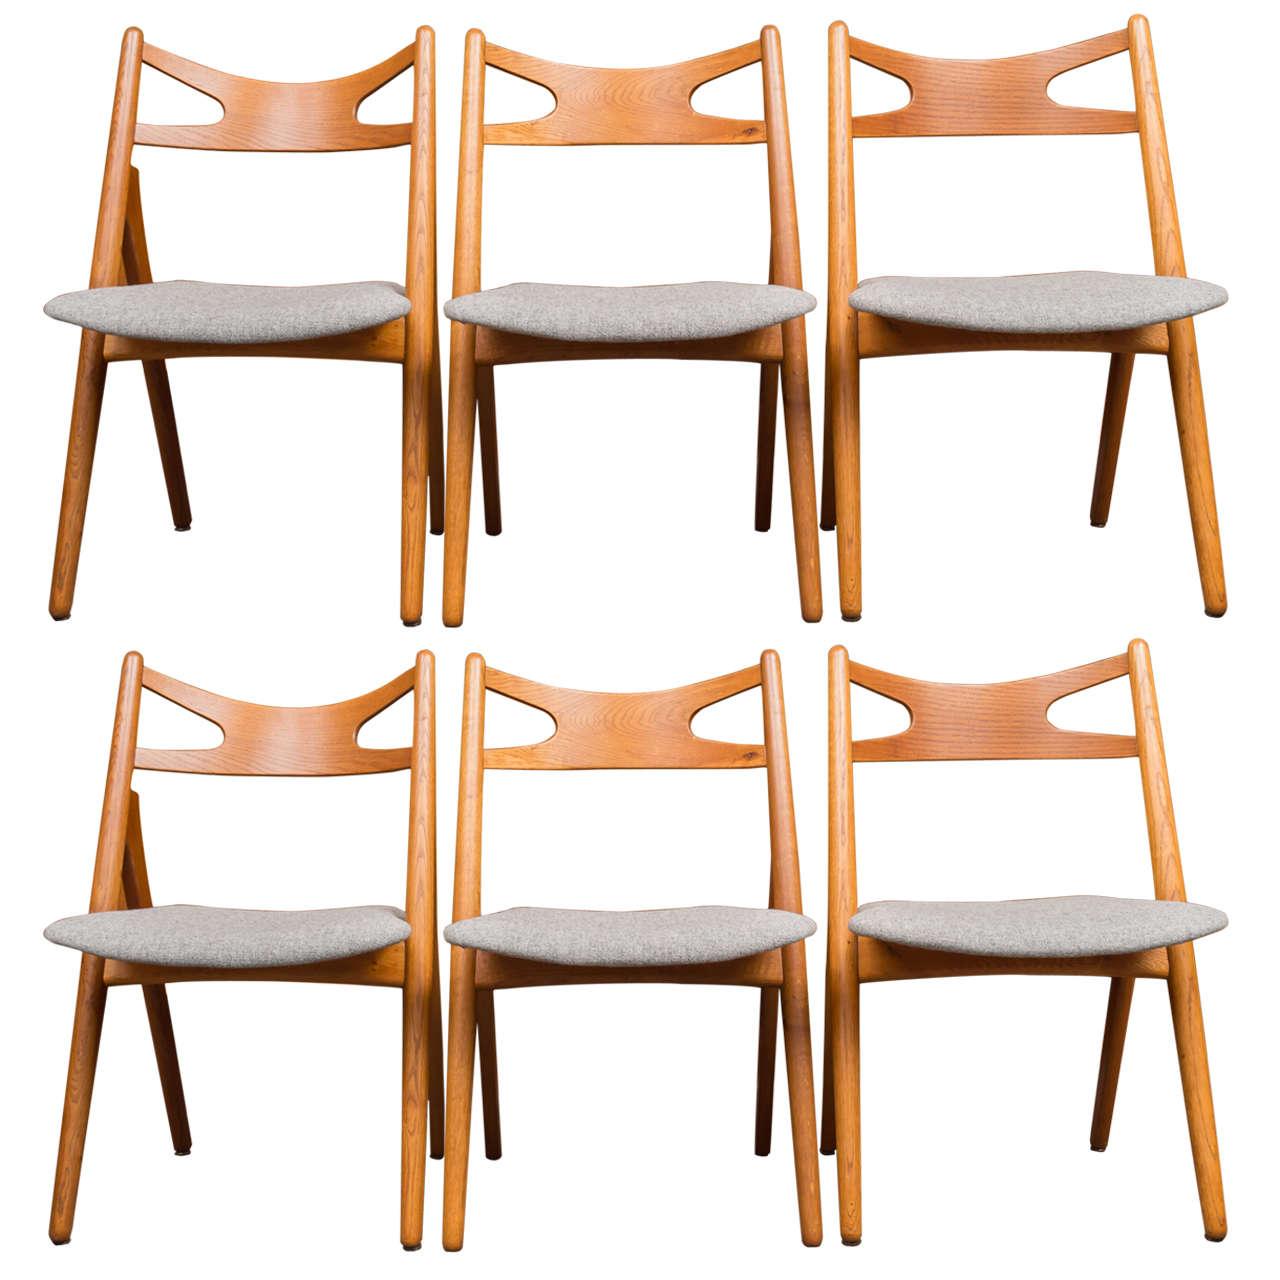 Hans J Wegner Sawbuck Chairs CH29 1